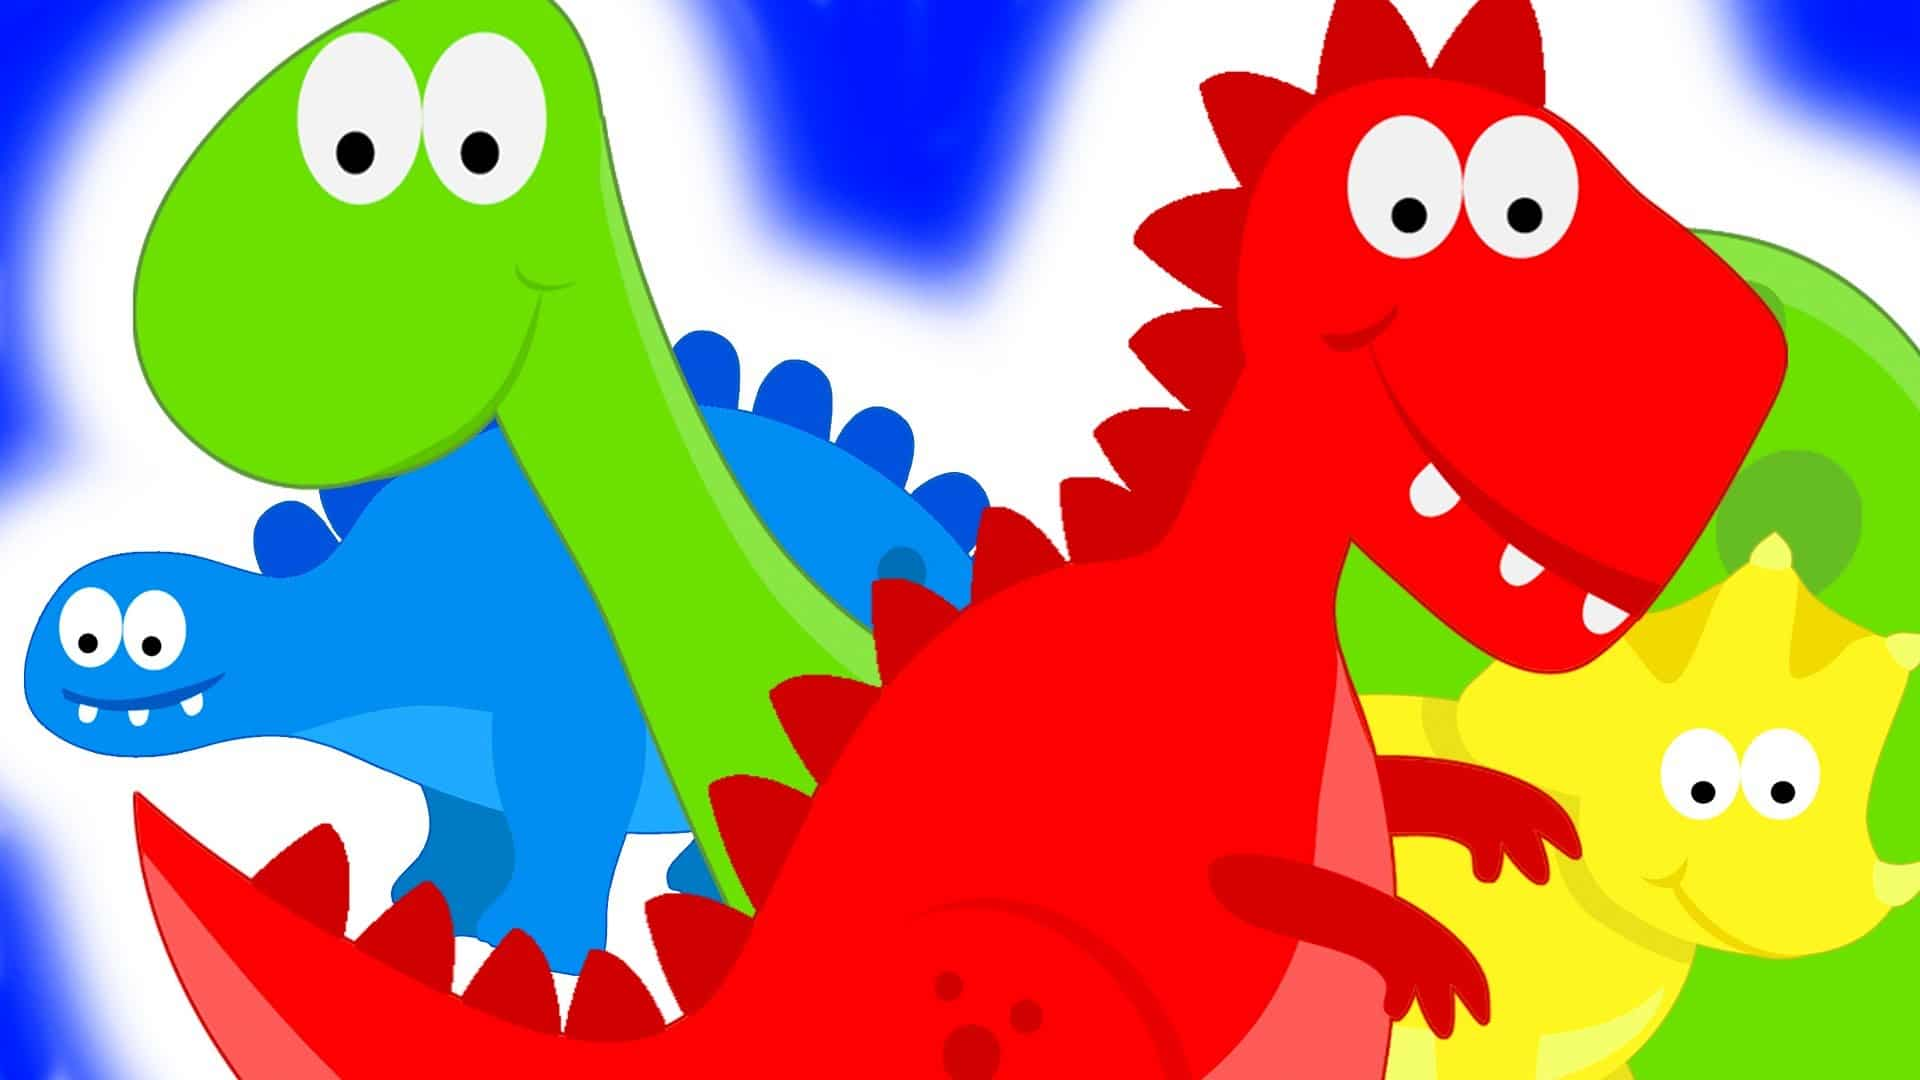 Dinosaurs Teaching Colors